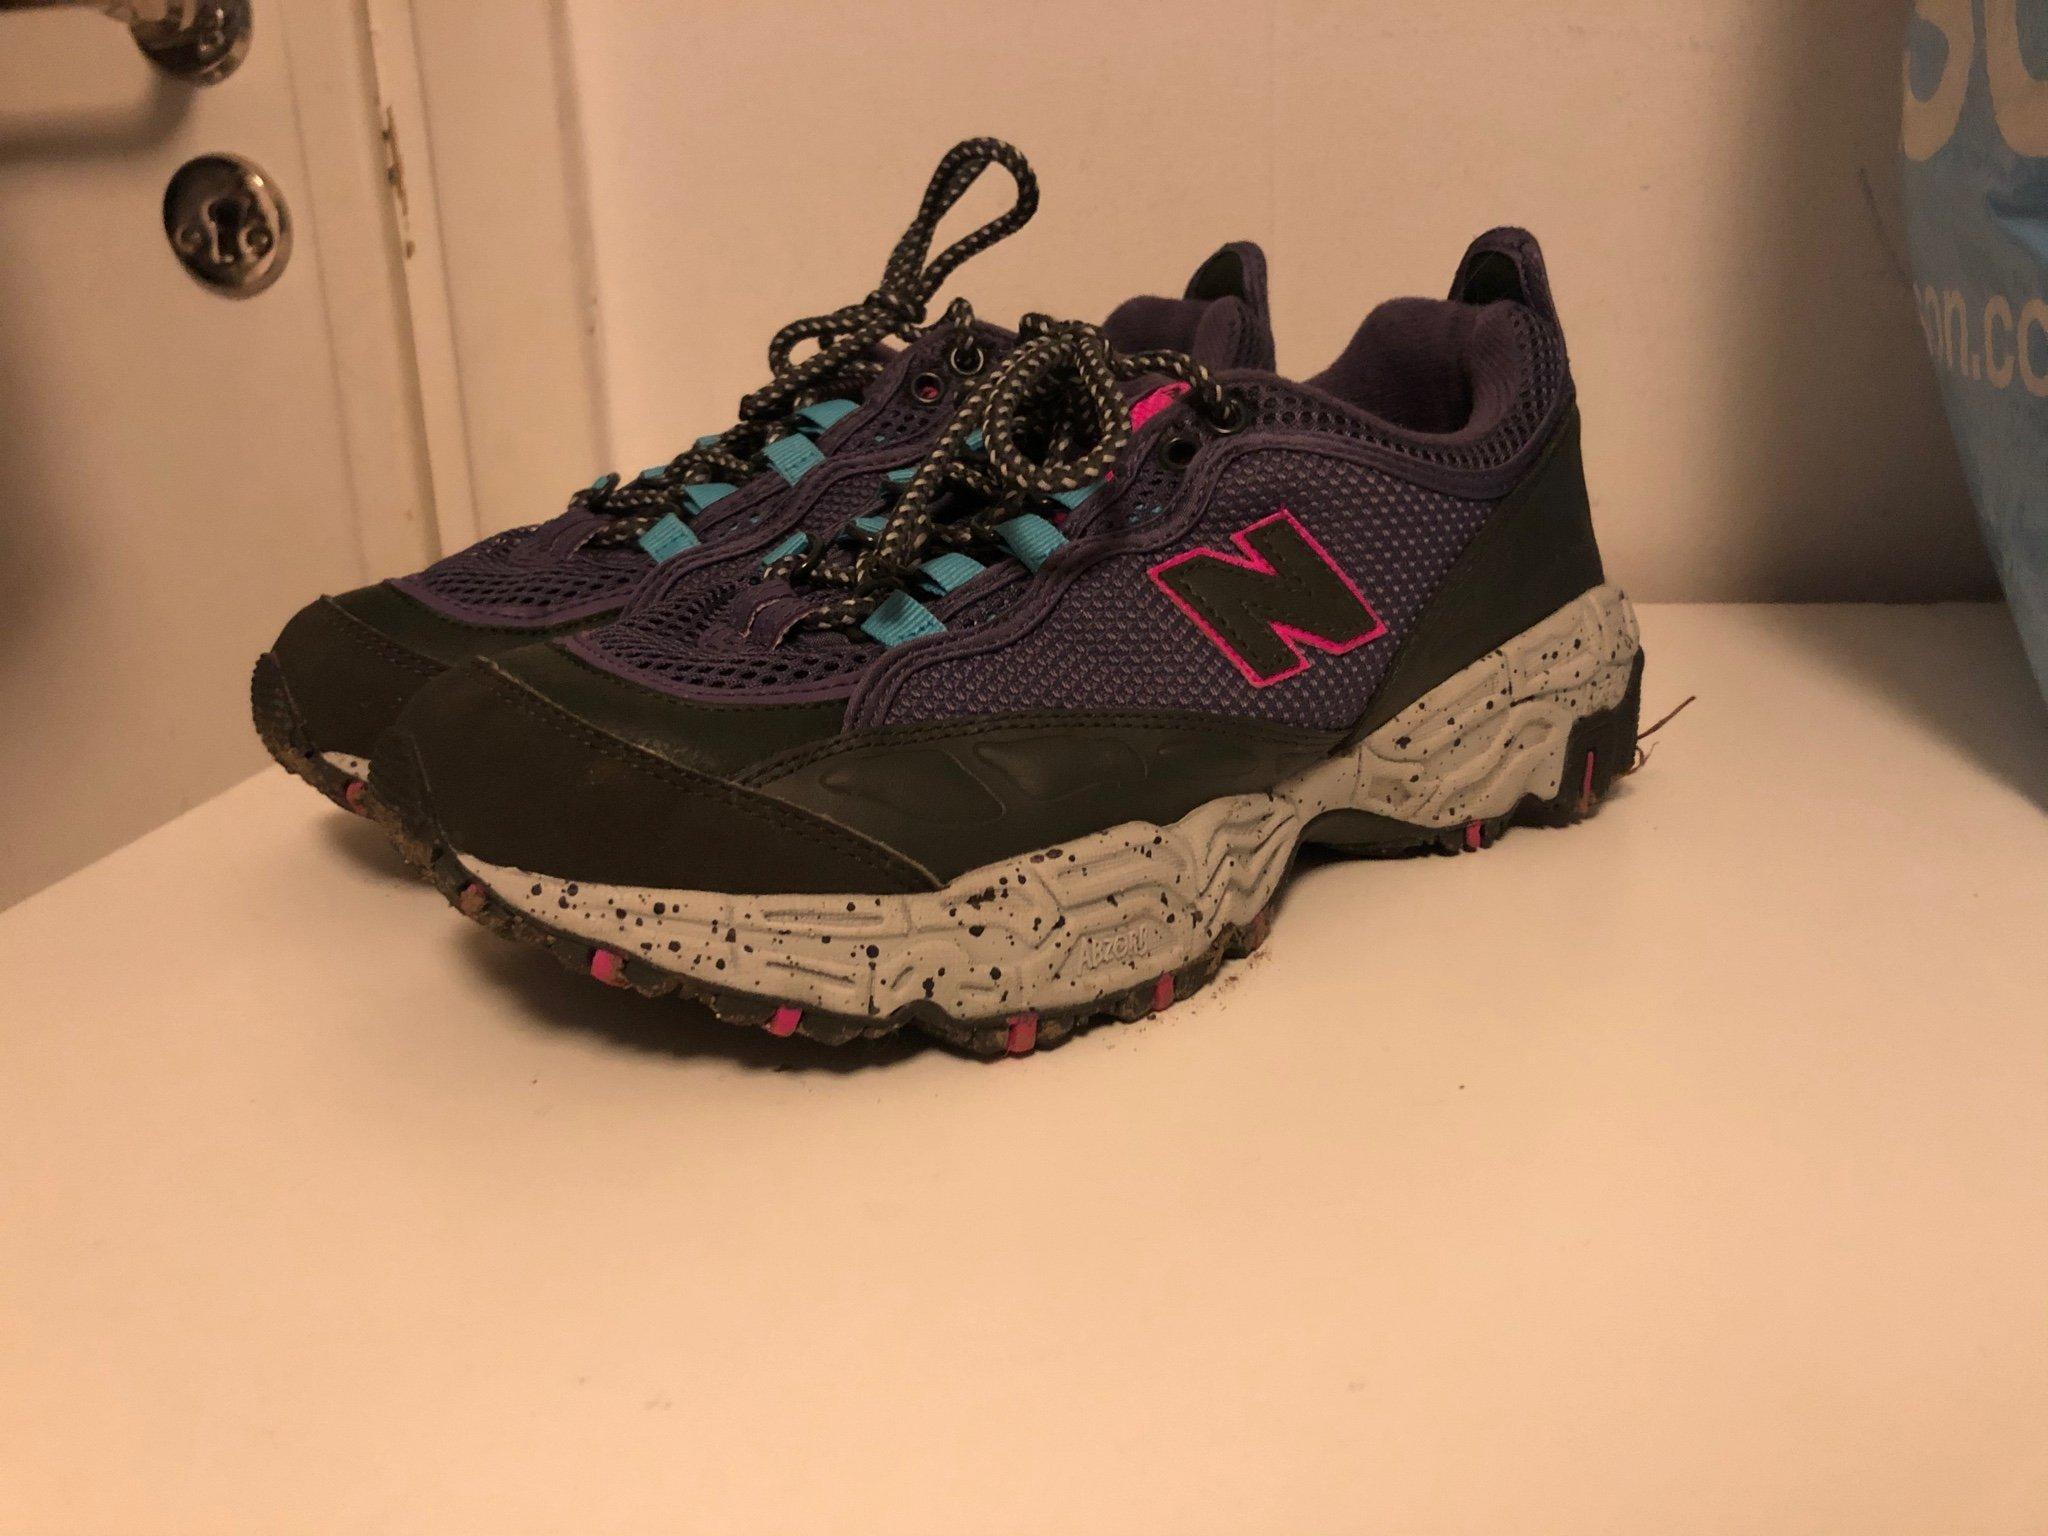 Adidas skor storlek 40 (Obs små i storleken!)